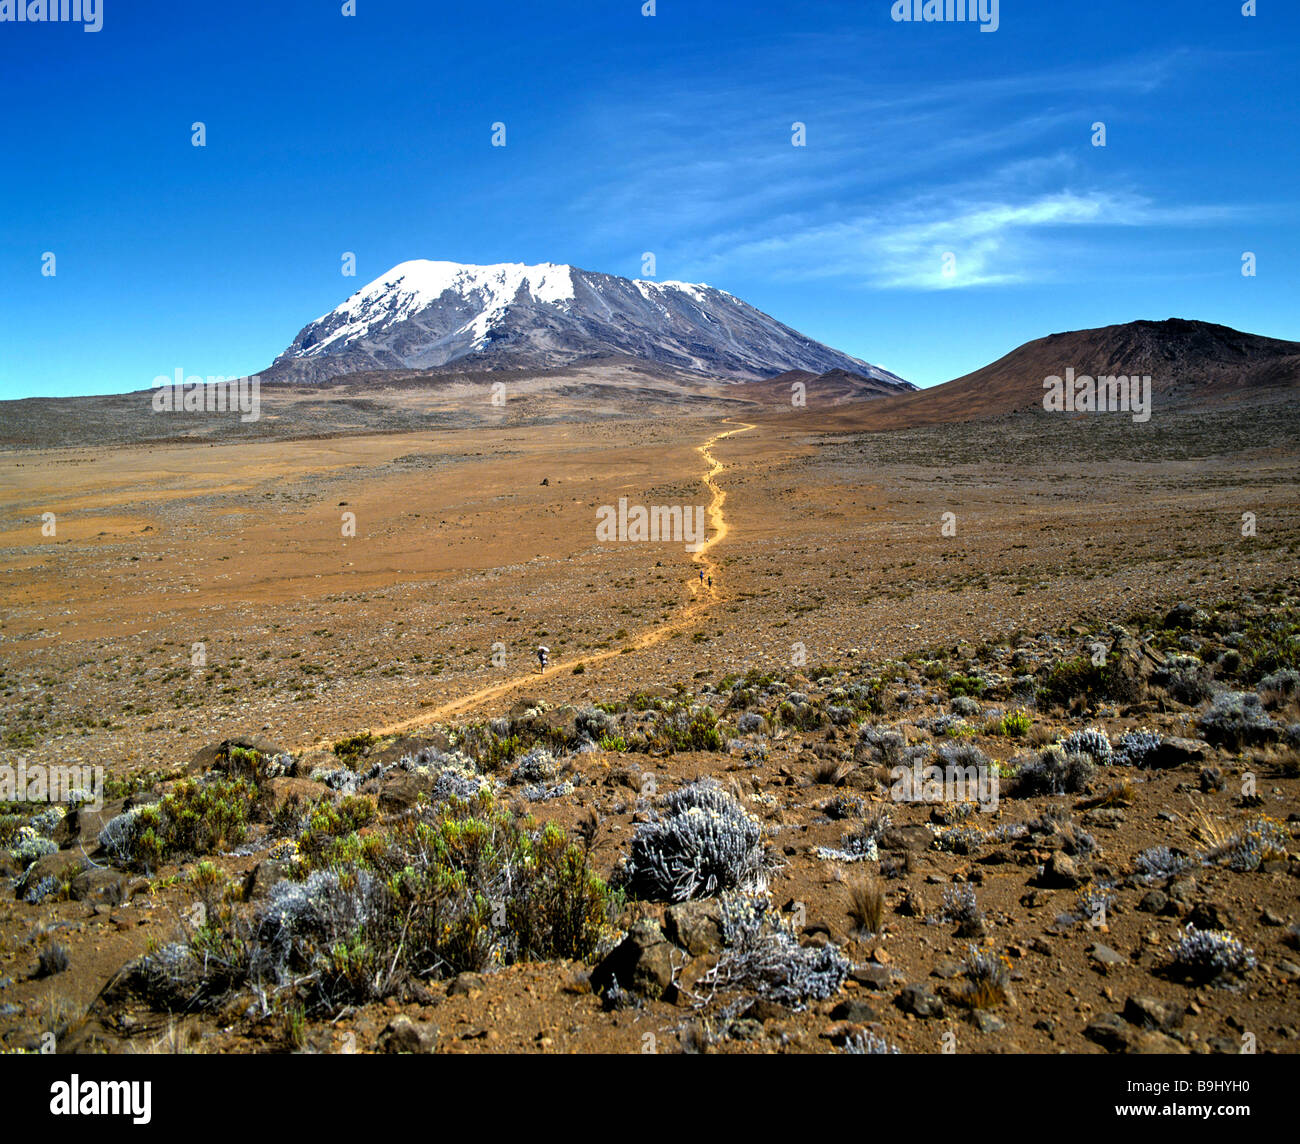 Path to Mount Kilimanjaro, Kilimanjaro National Park, UNESCO World Heritage Site, stratovolcano, Tanzania, East - Stock Image